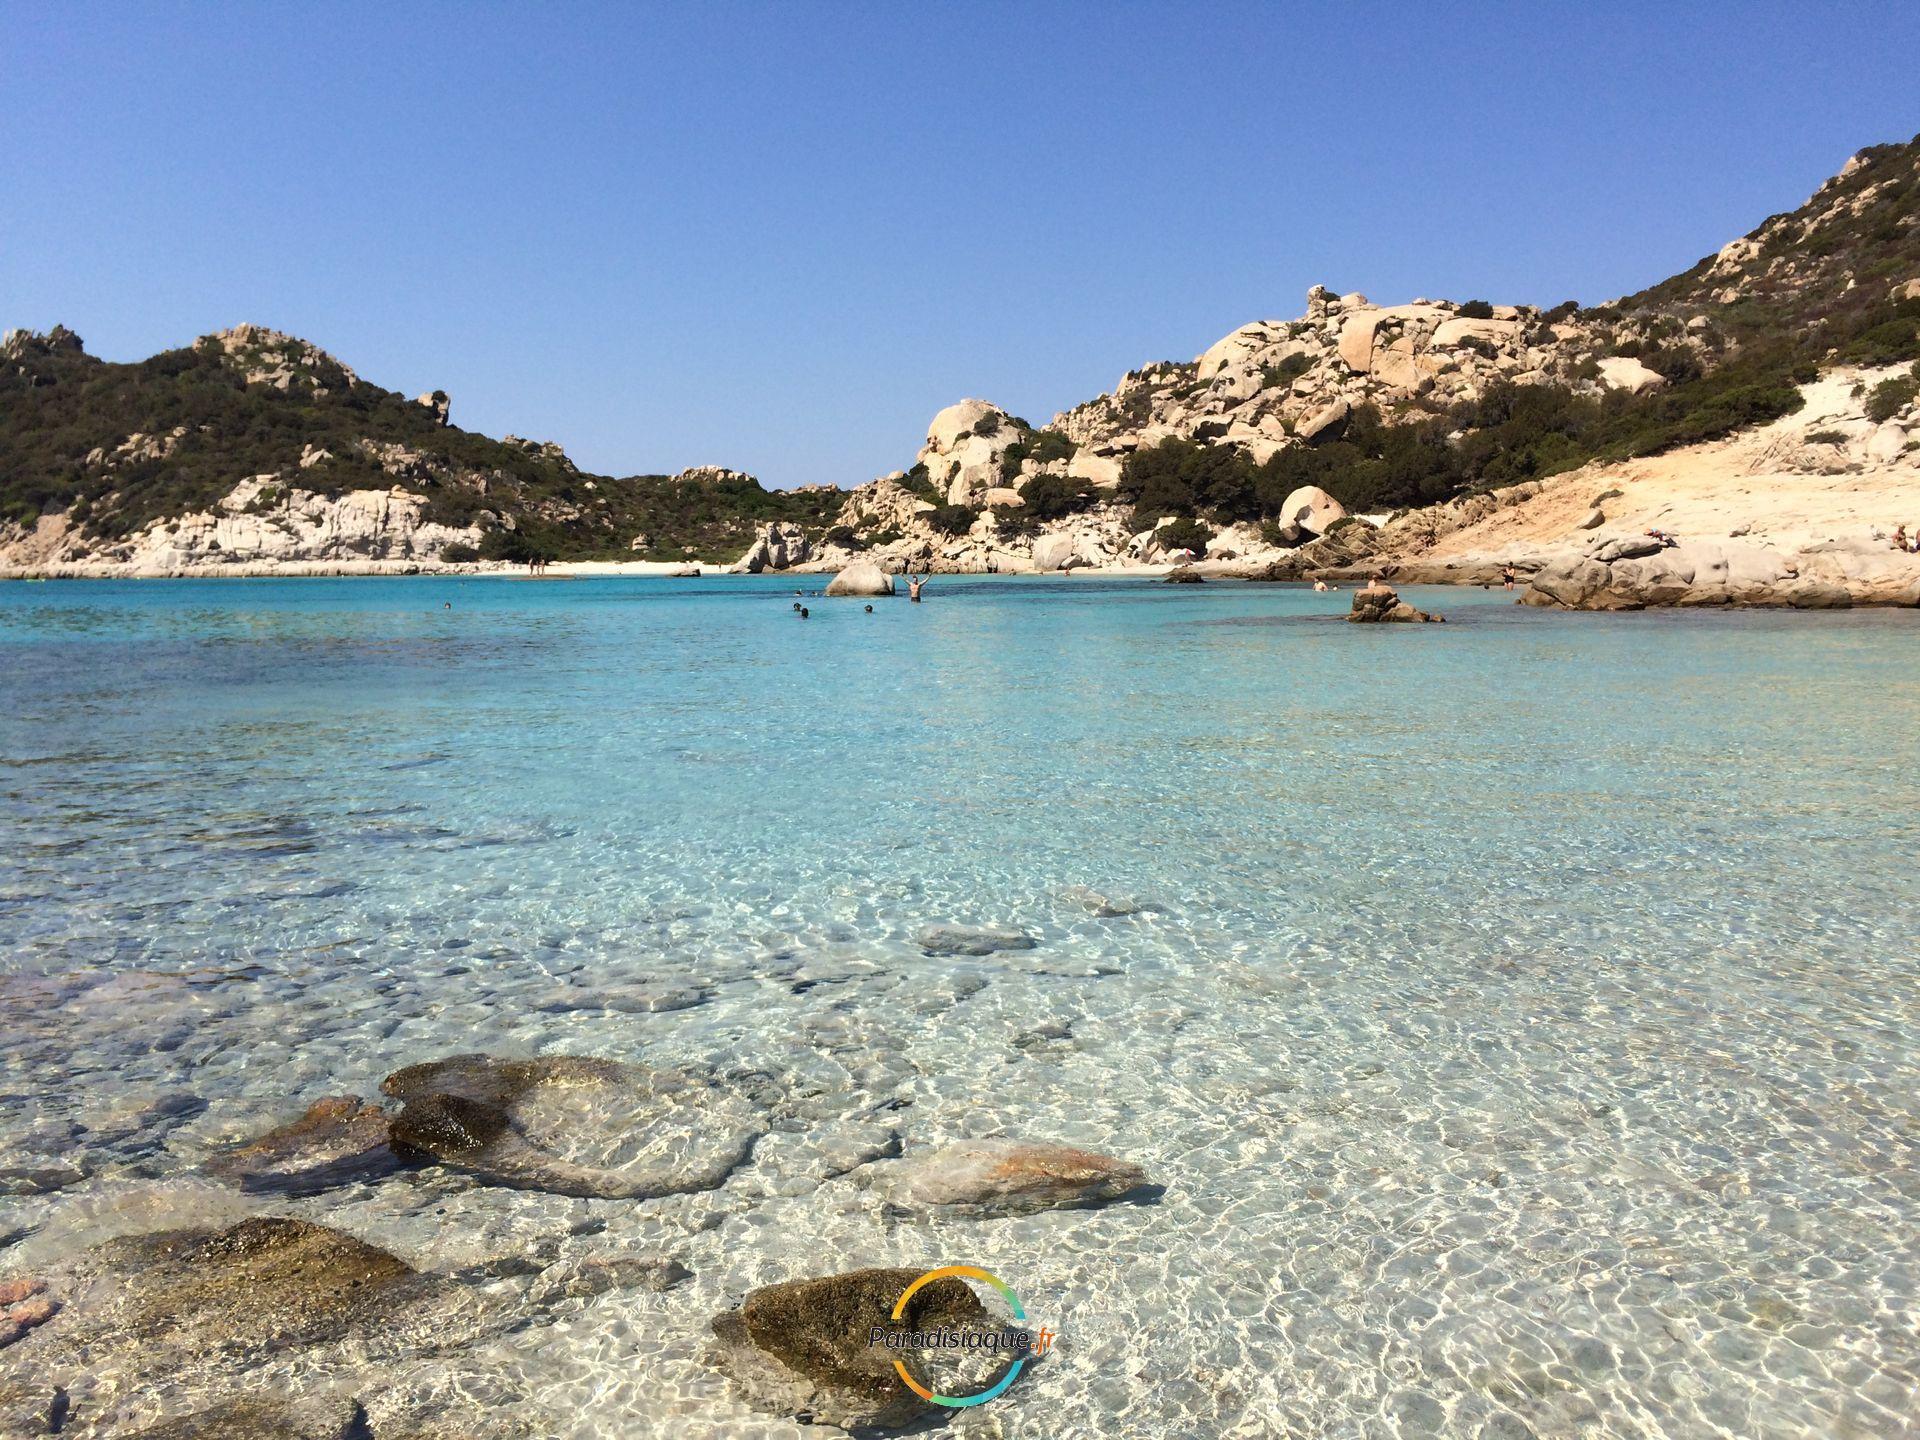 Olbia, Costa Smeralda et Archipel de La Maddalena